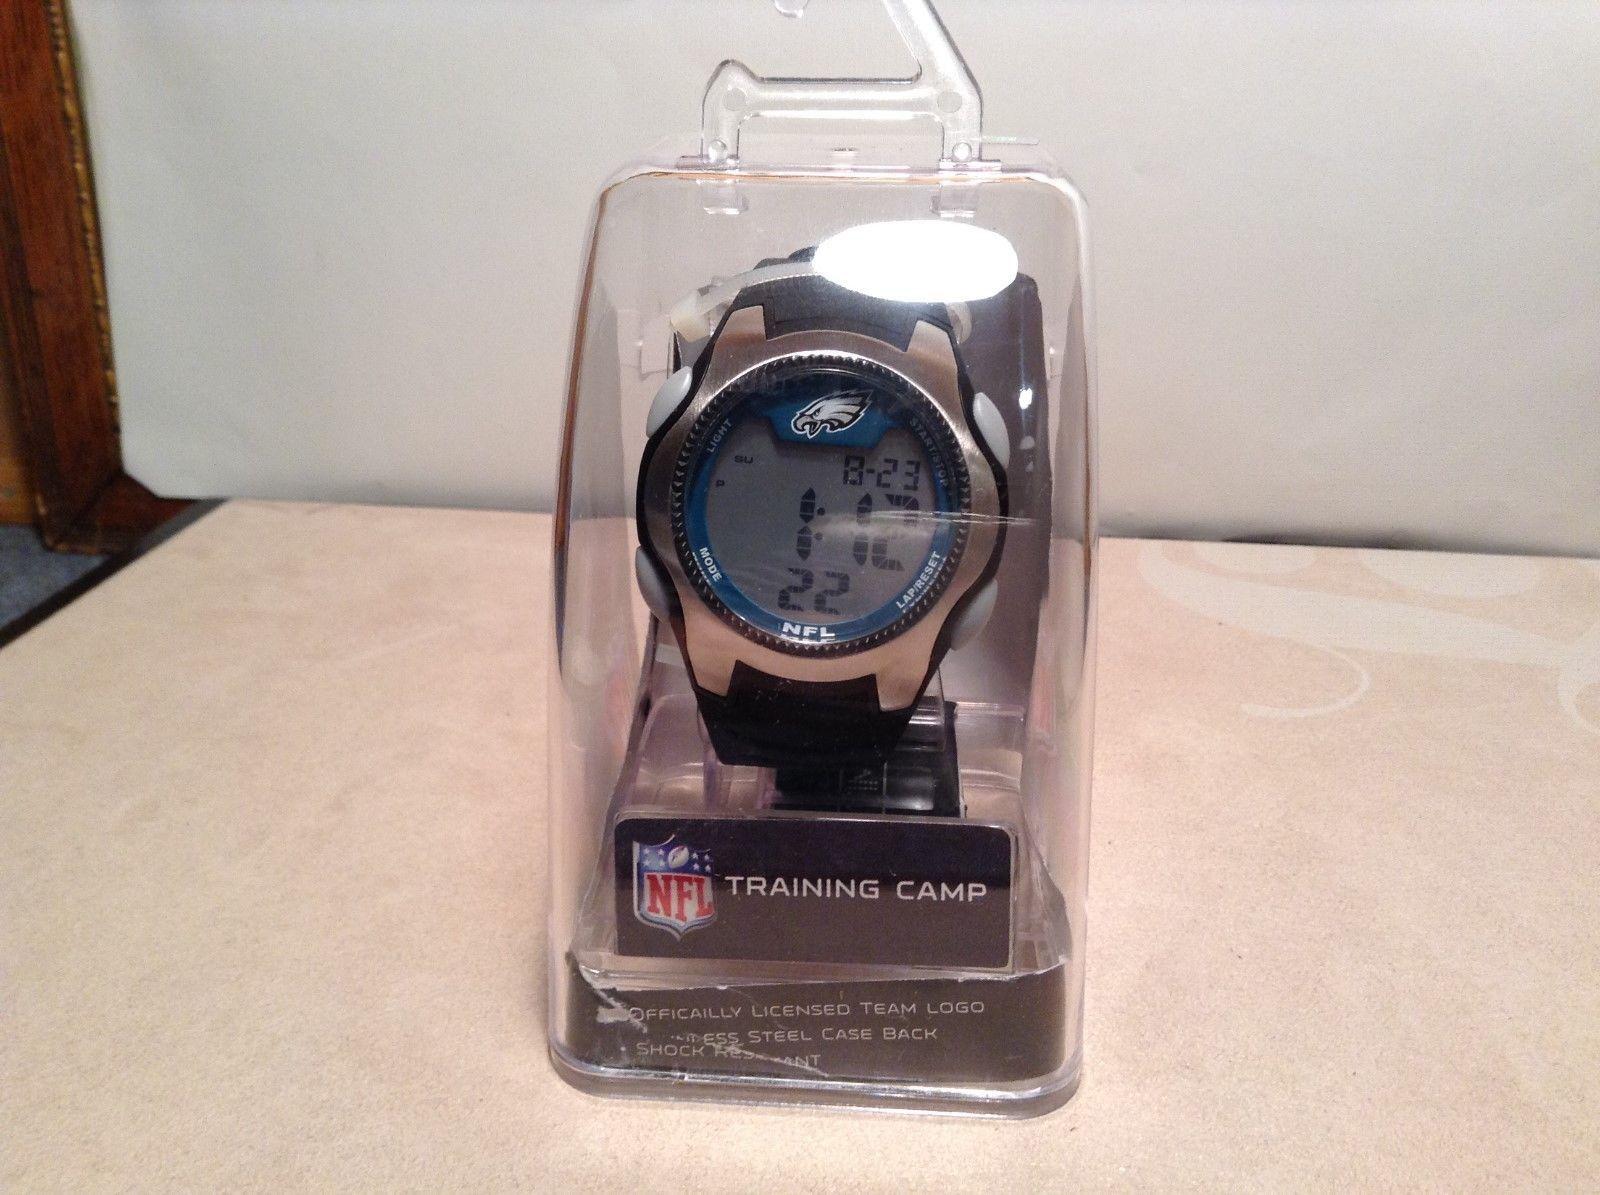 Philadelphia Eagles Certified NFL Digital Training Camp Watch